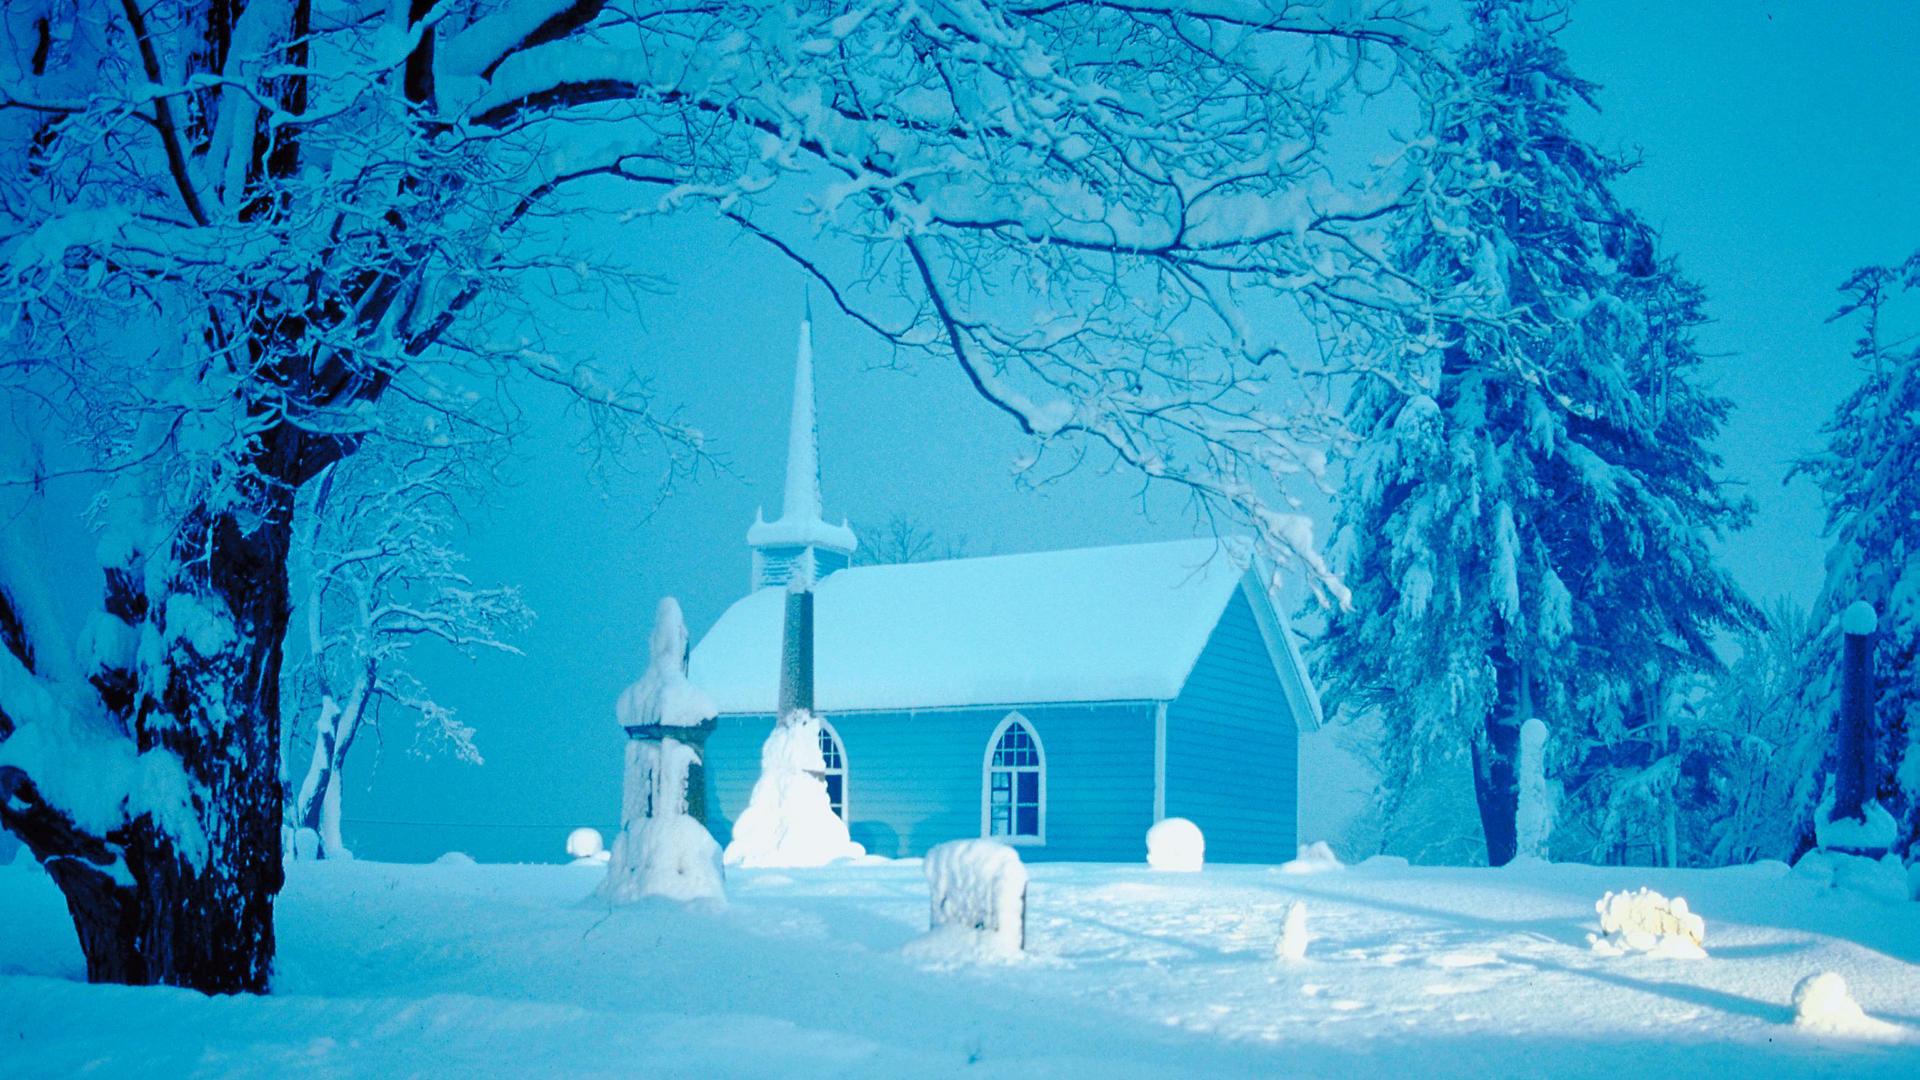 scenic winter beautiful wallpapers - photo #34